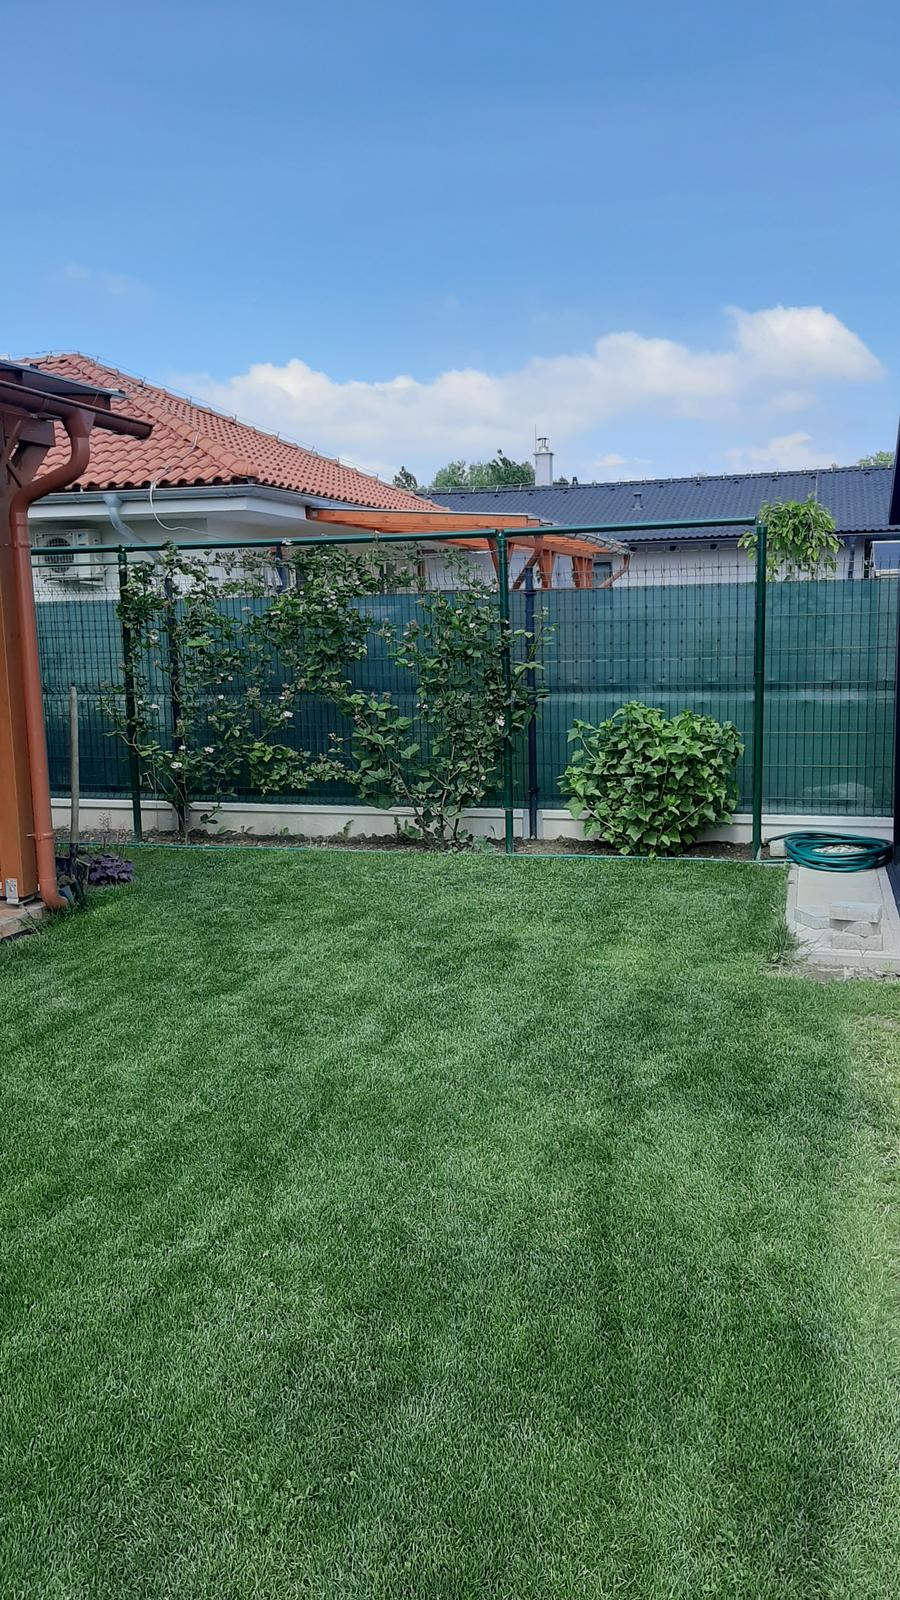 🏠🌞🌺❤🌷 Zahrada a jej dalsi rok...2020 🌱🐞🐛🦋🍓🥕🍅🌺❤ - Manzel musel dorobit konstrukciu na cernice kedze sa velmi rozrastaju...